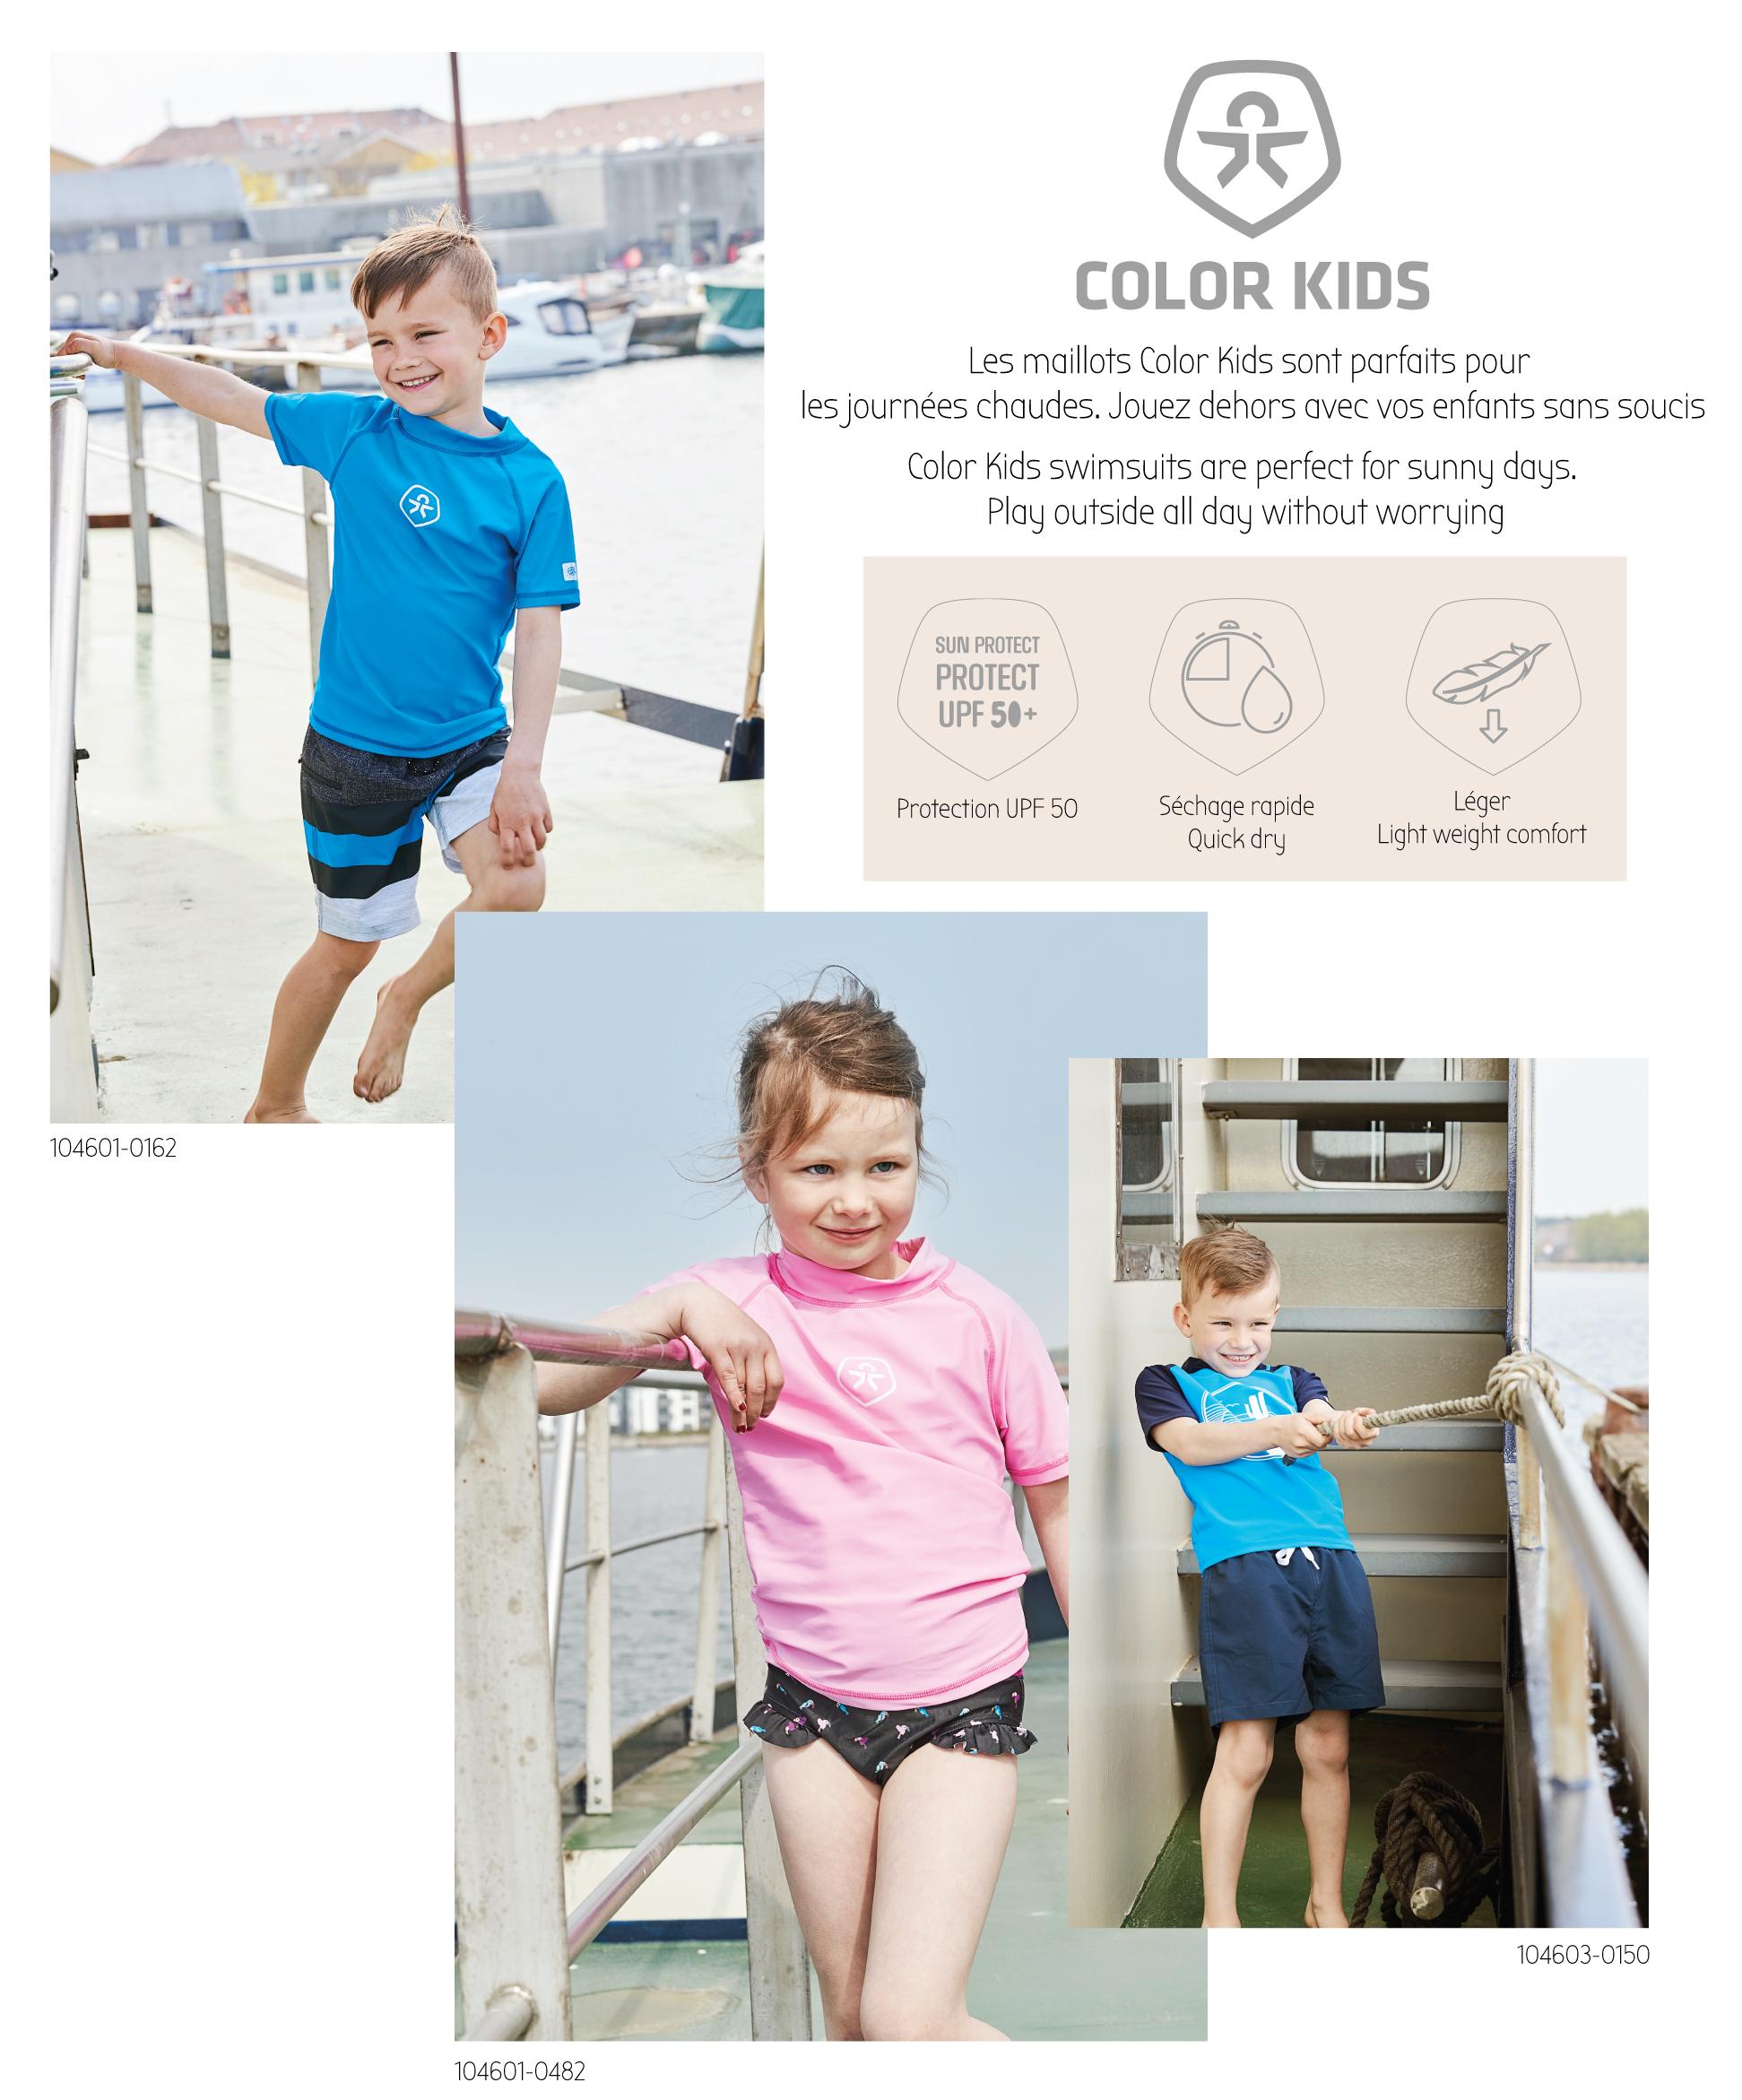 color-kids-2020-06-10-2.jpg